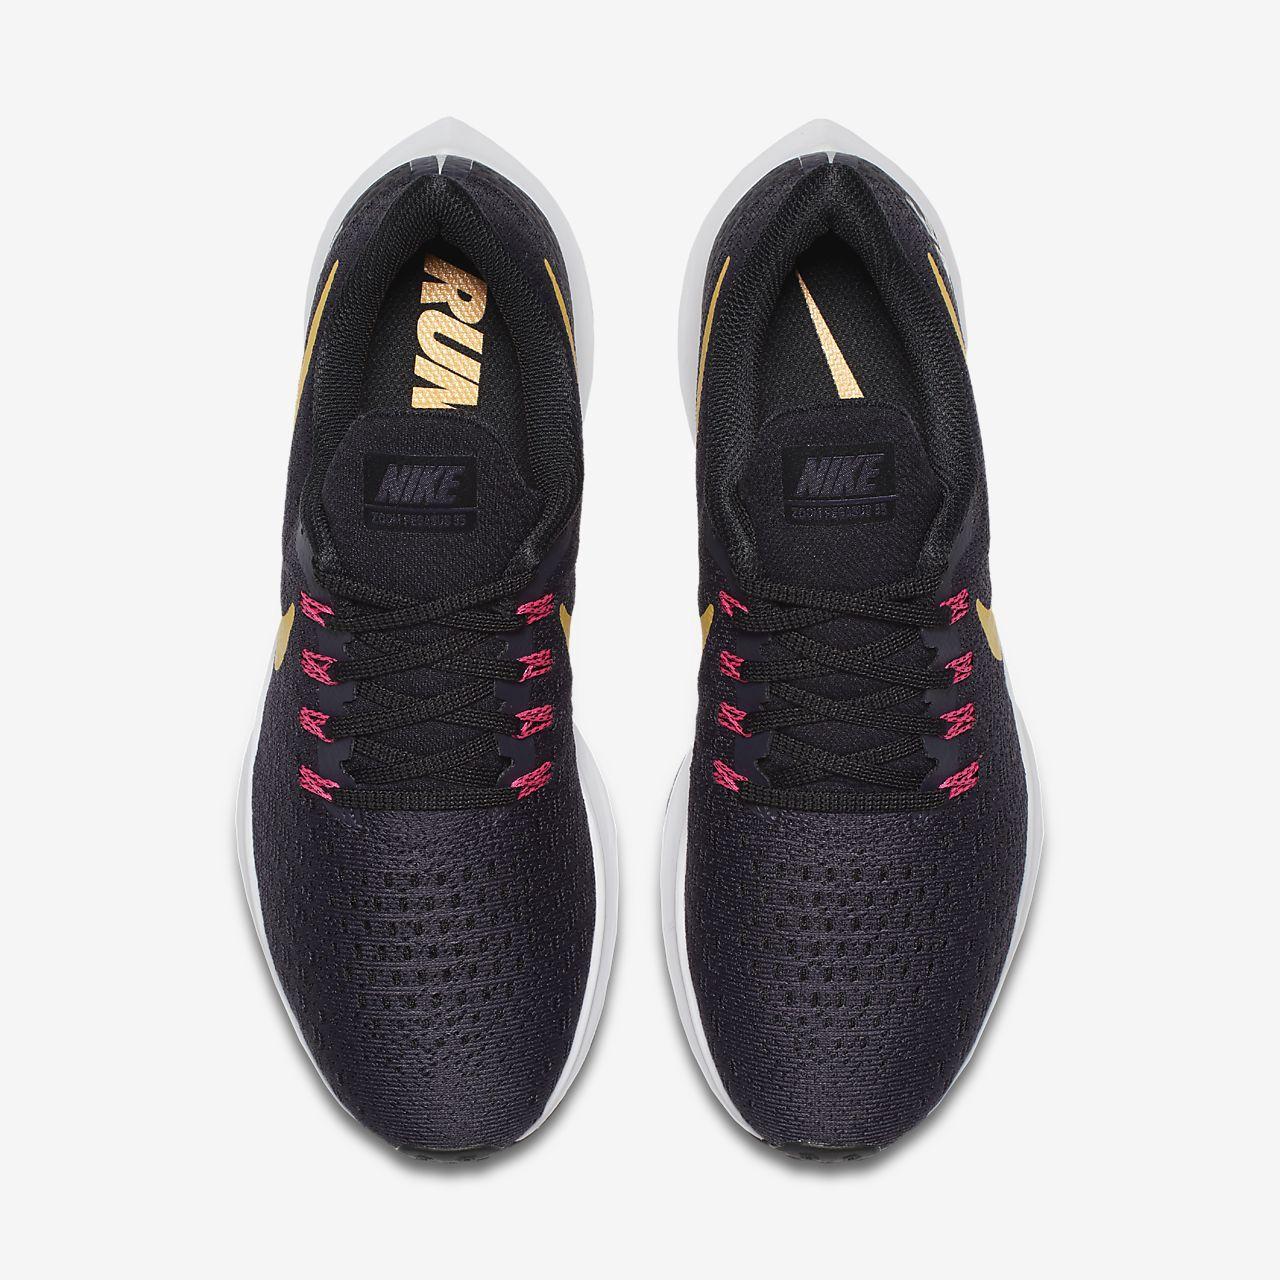 brand new f1ee3 93633 Nike Air Zoom Pegasus 35 Women s Running Shoe - 5.5 Orange